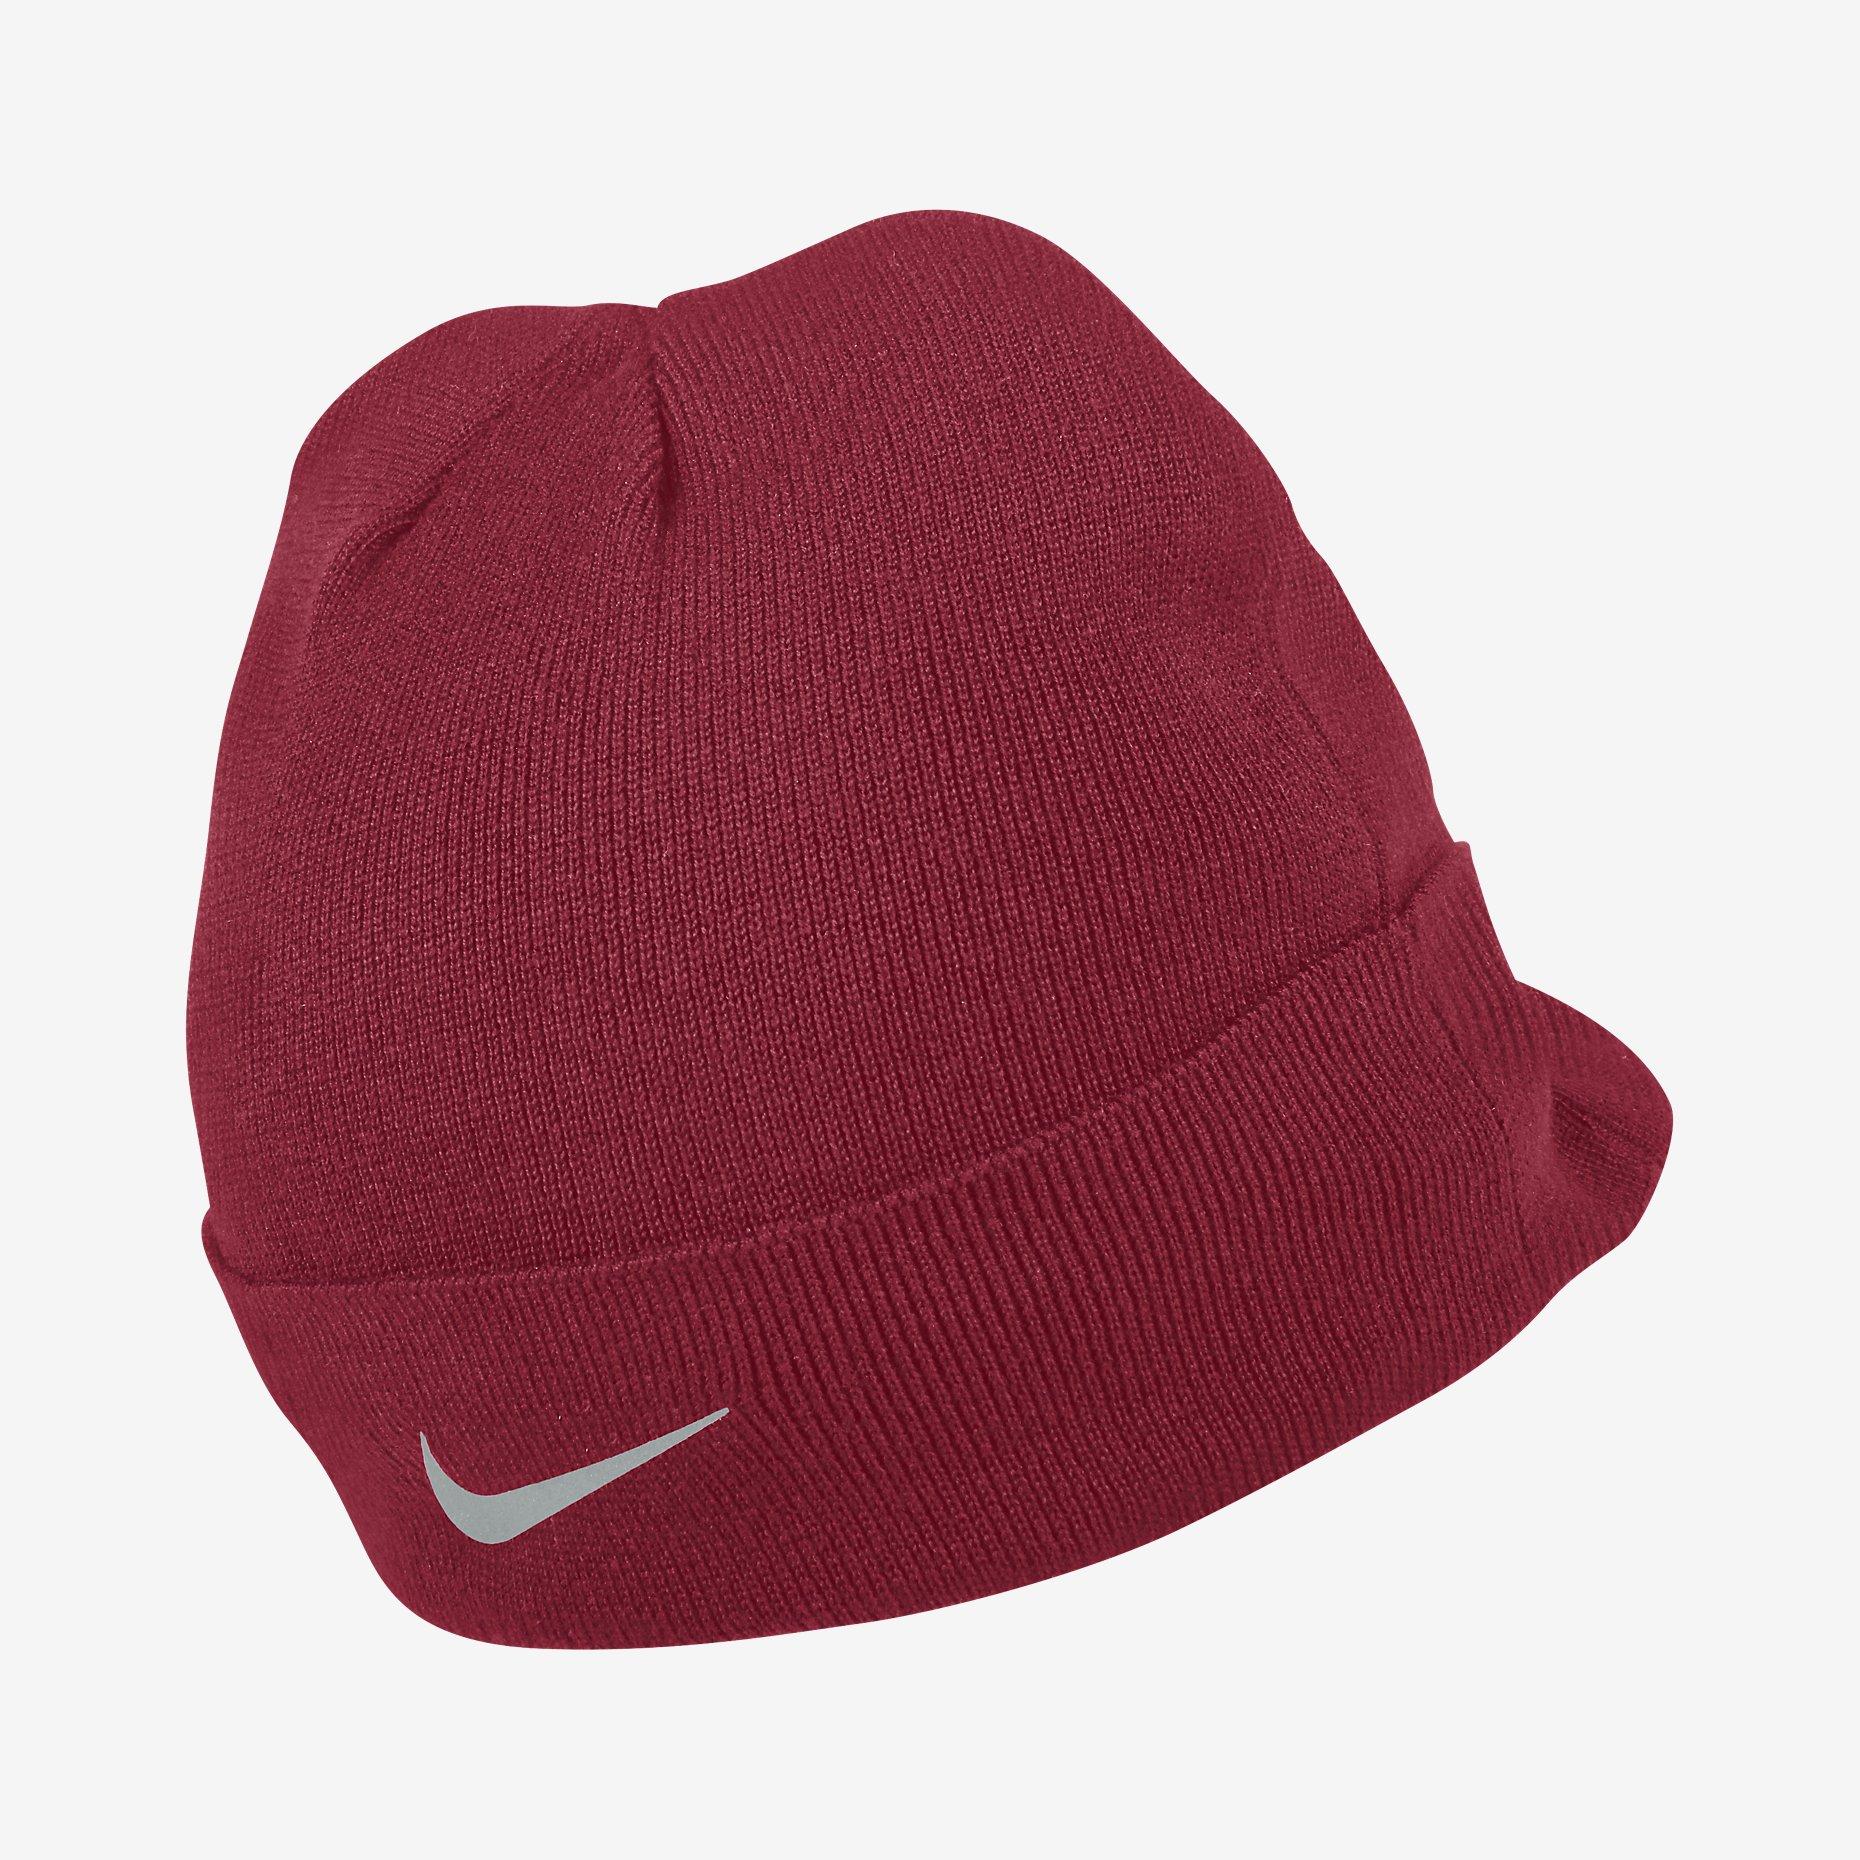 Knitting Pattern For Running Hat : Nike Unisex Run Crew Radar Knit Running Hat Cap eBay